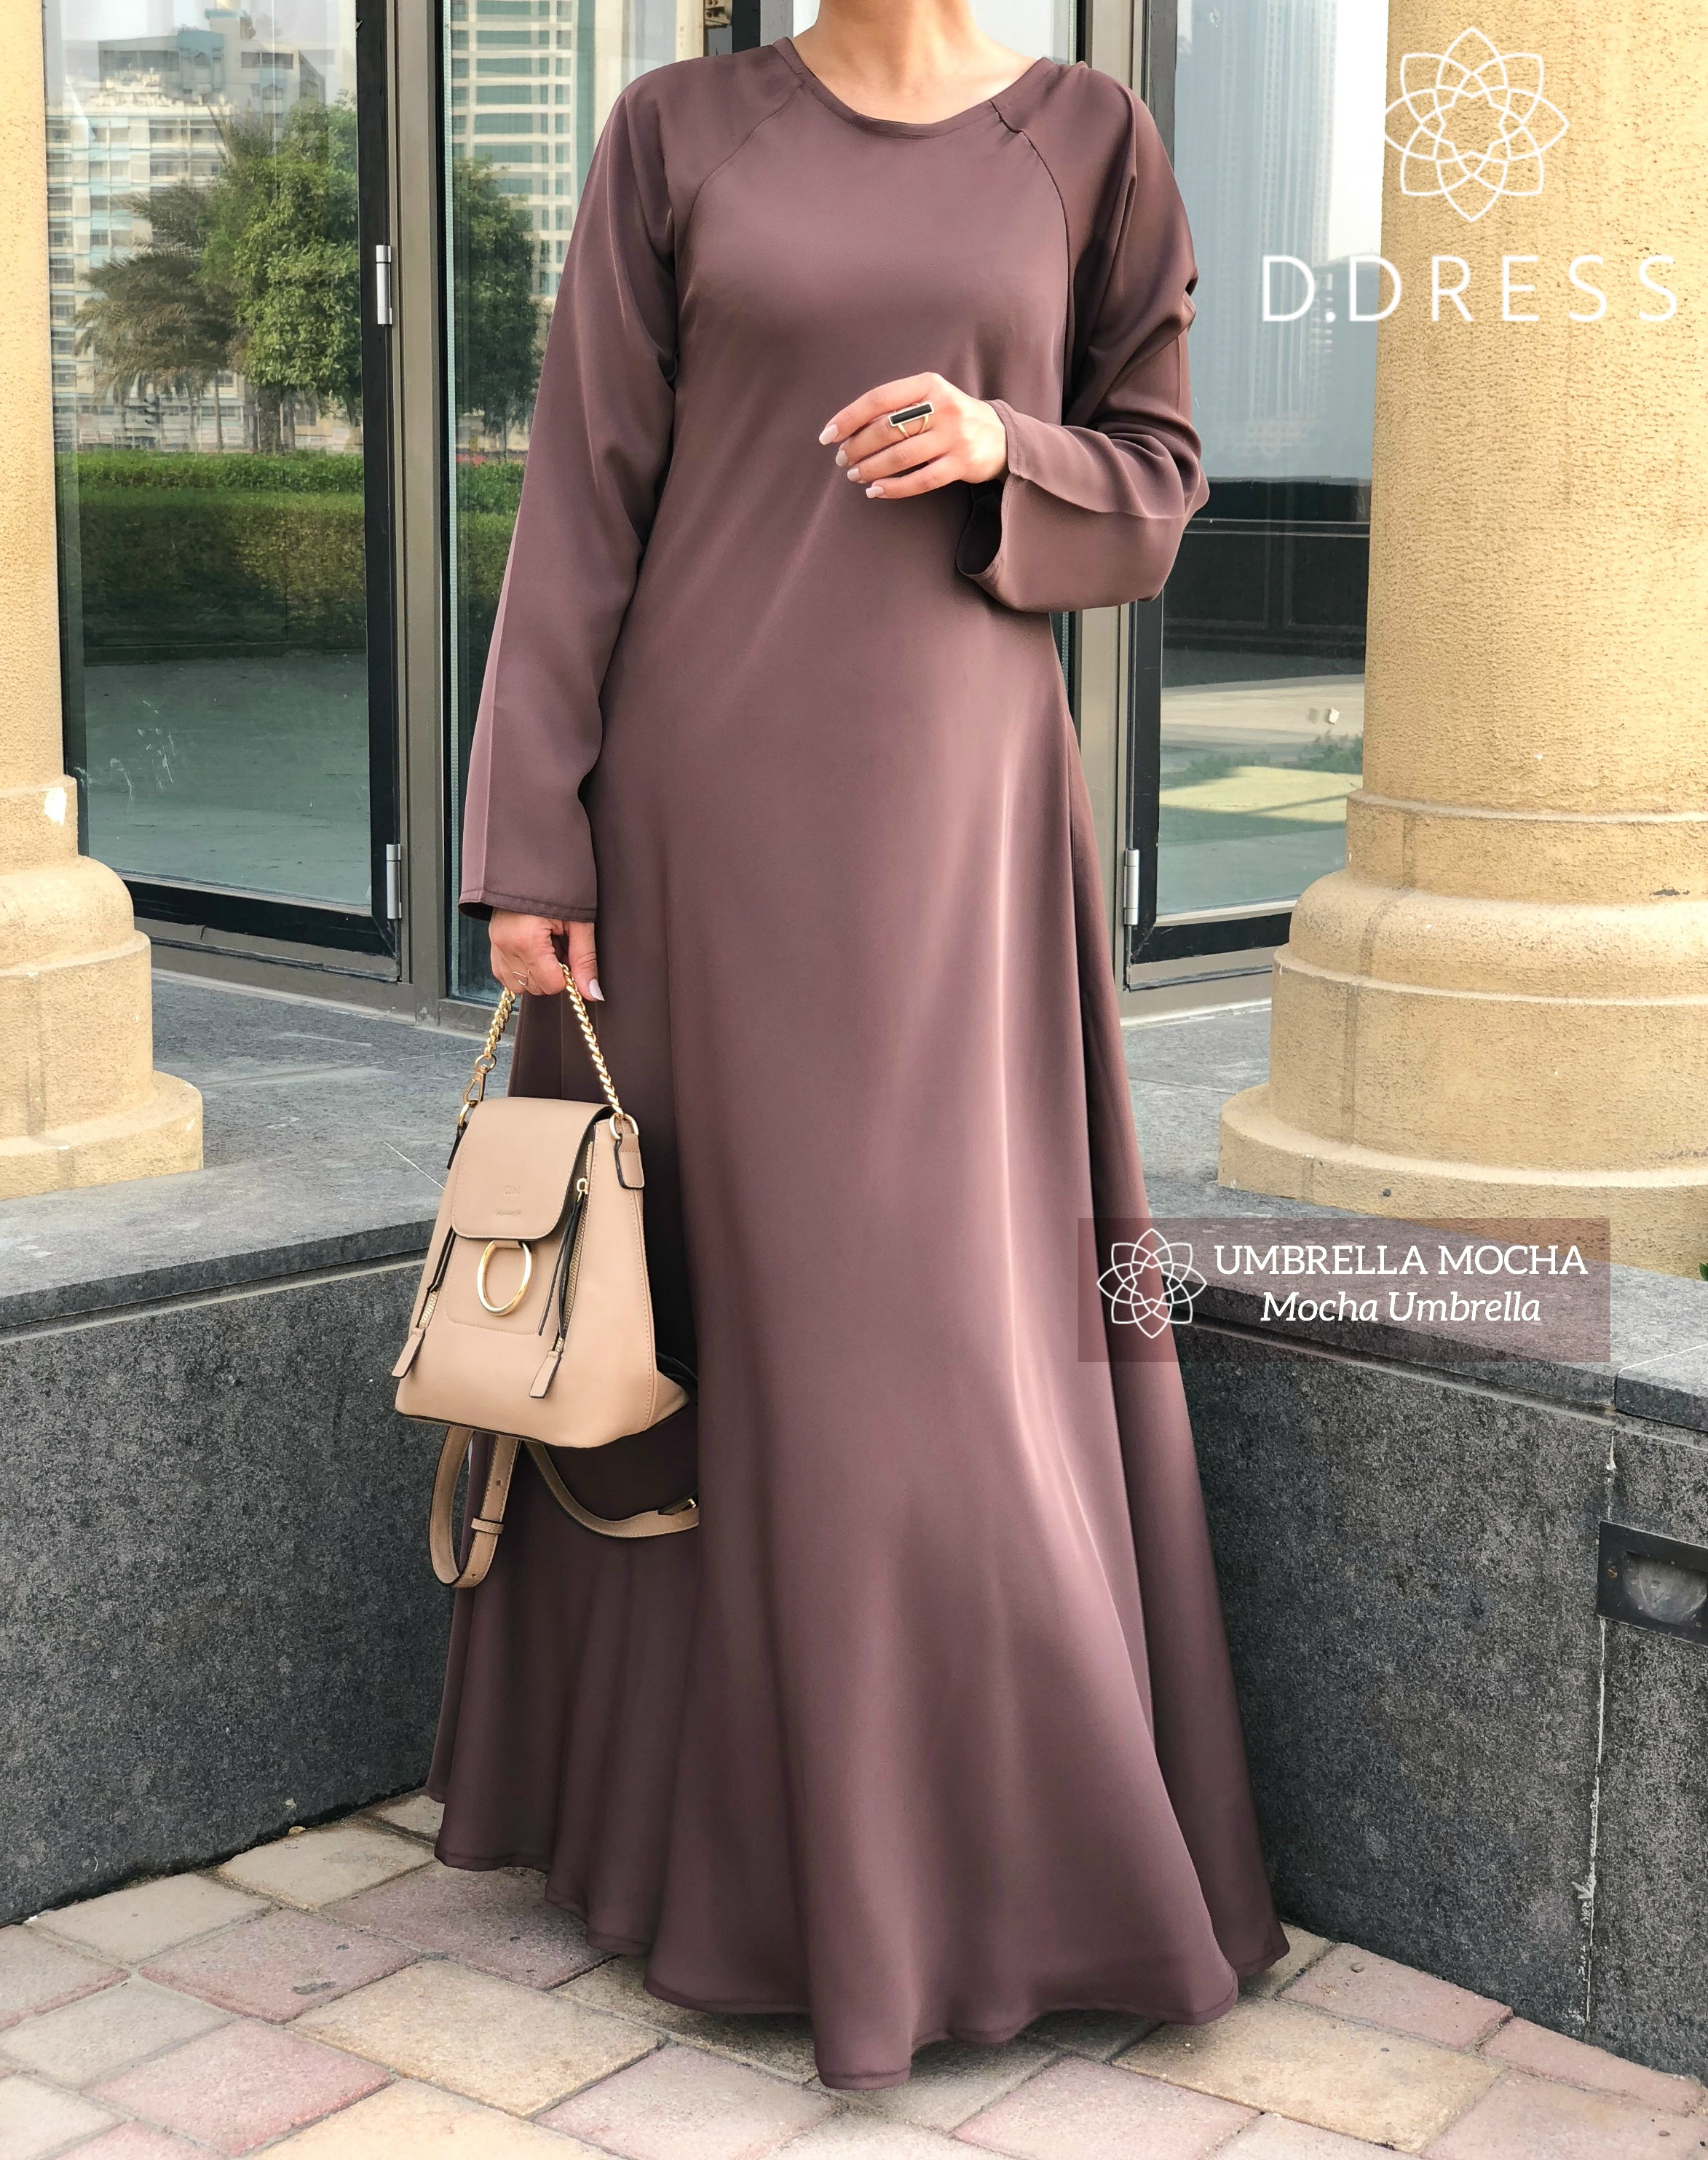 umbrella mocha d.dress niche nidah abaya